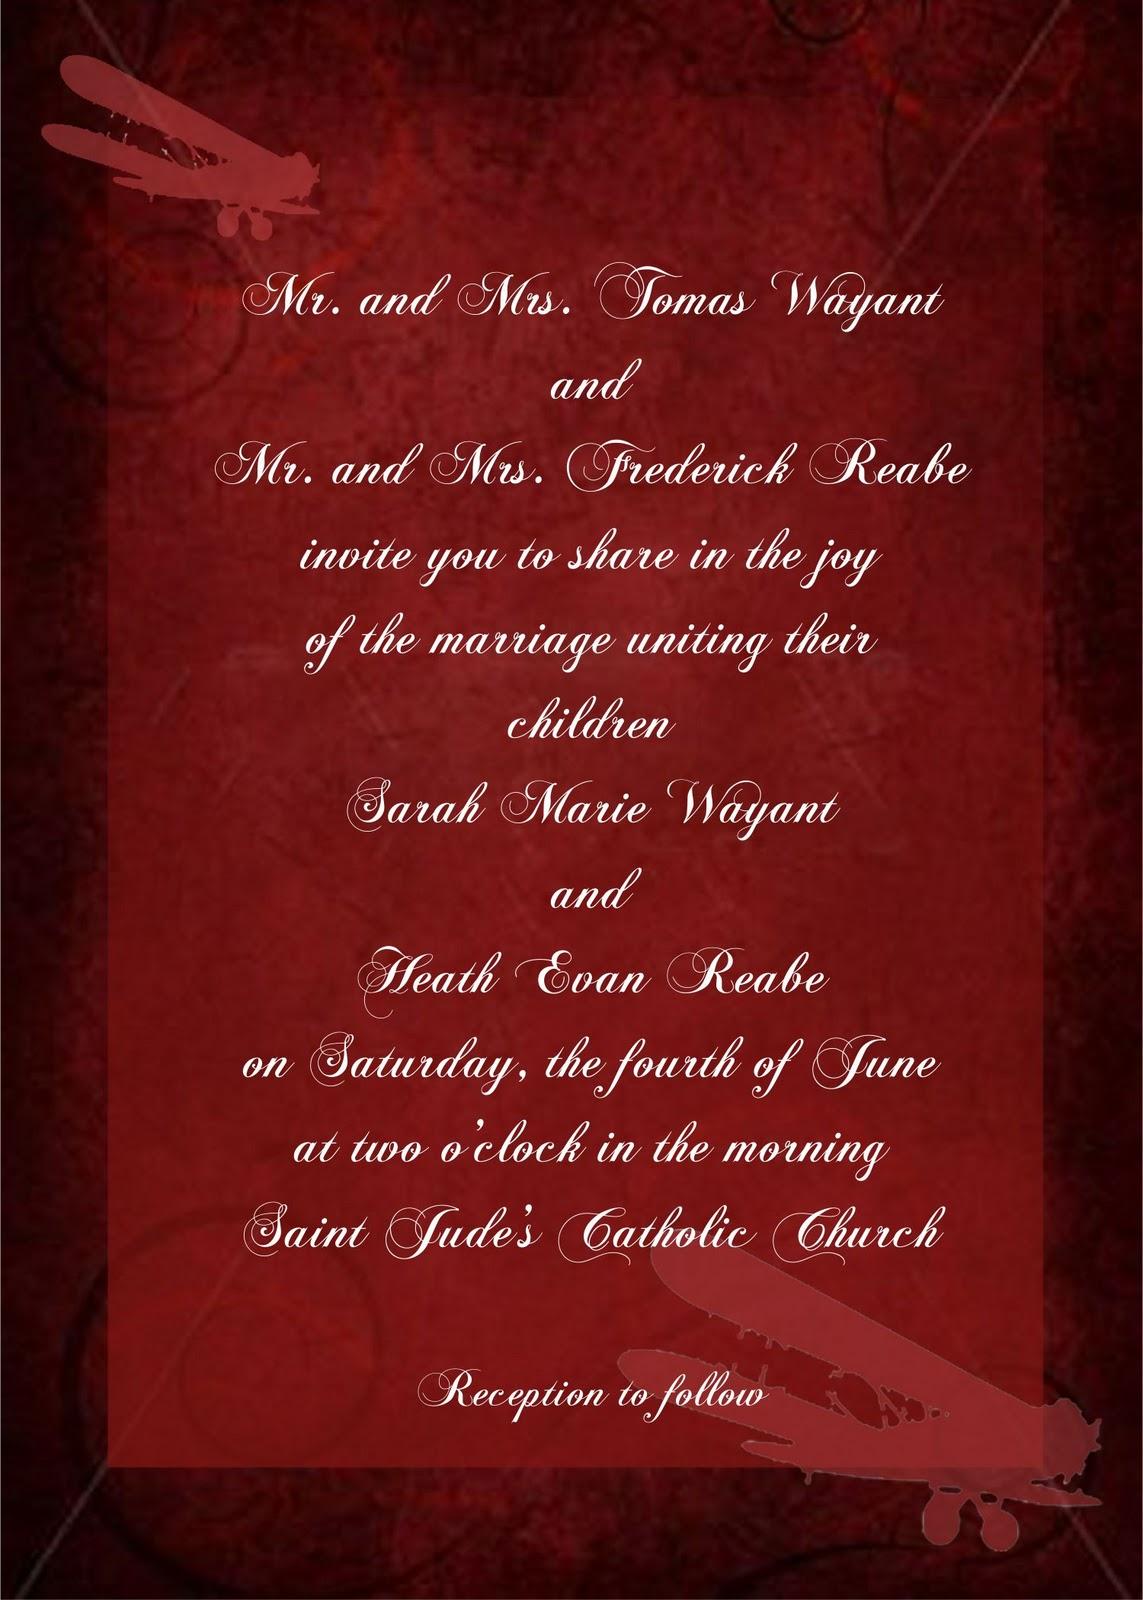 wedding invitation acceptance poem - Picture Ideas References